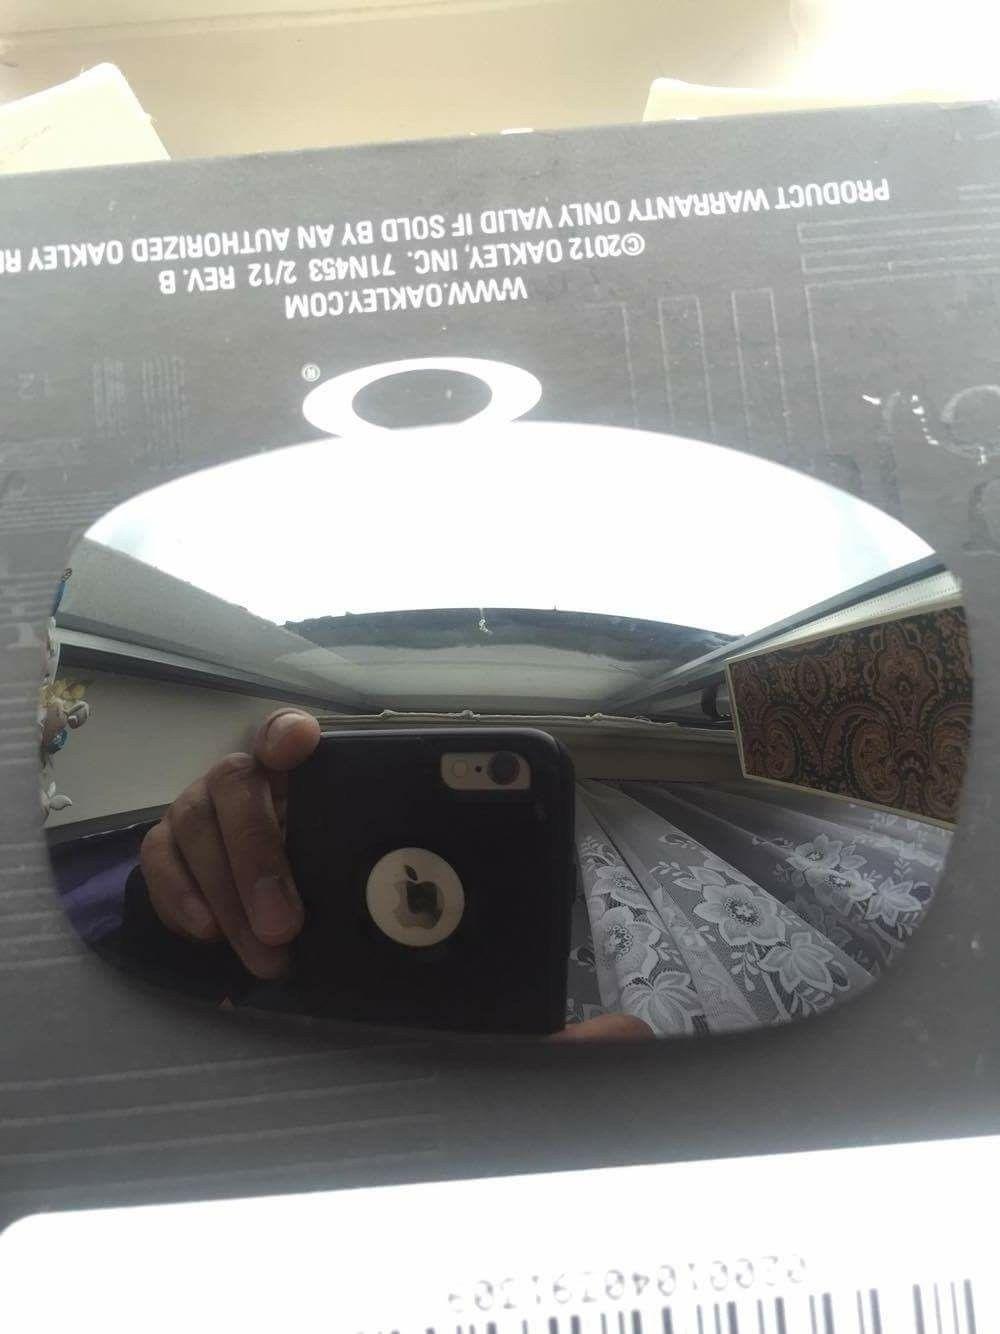 1 set still available of OEM Xsquared Ducati black iridium lenses - image.jpeg